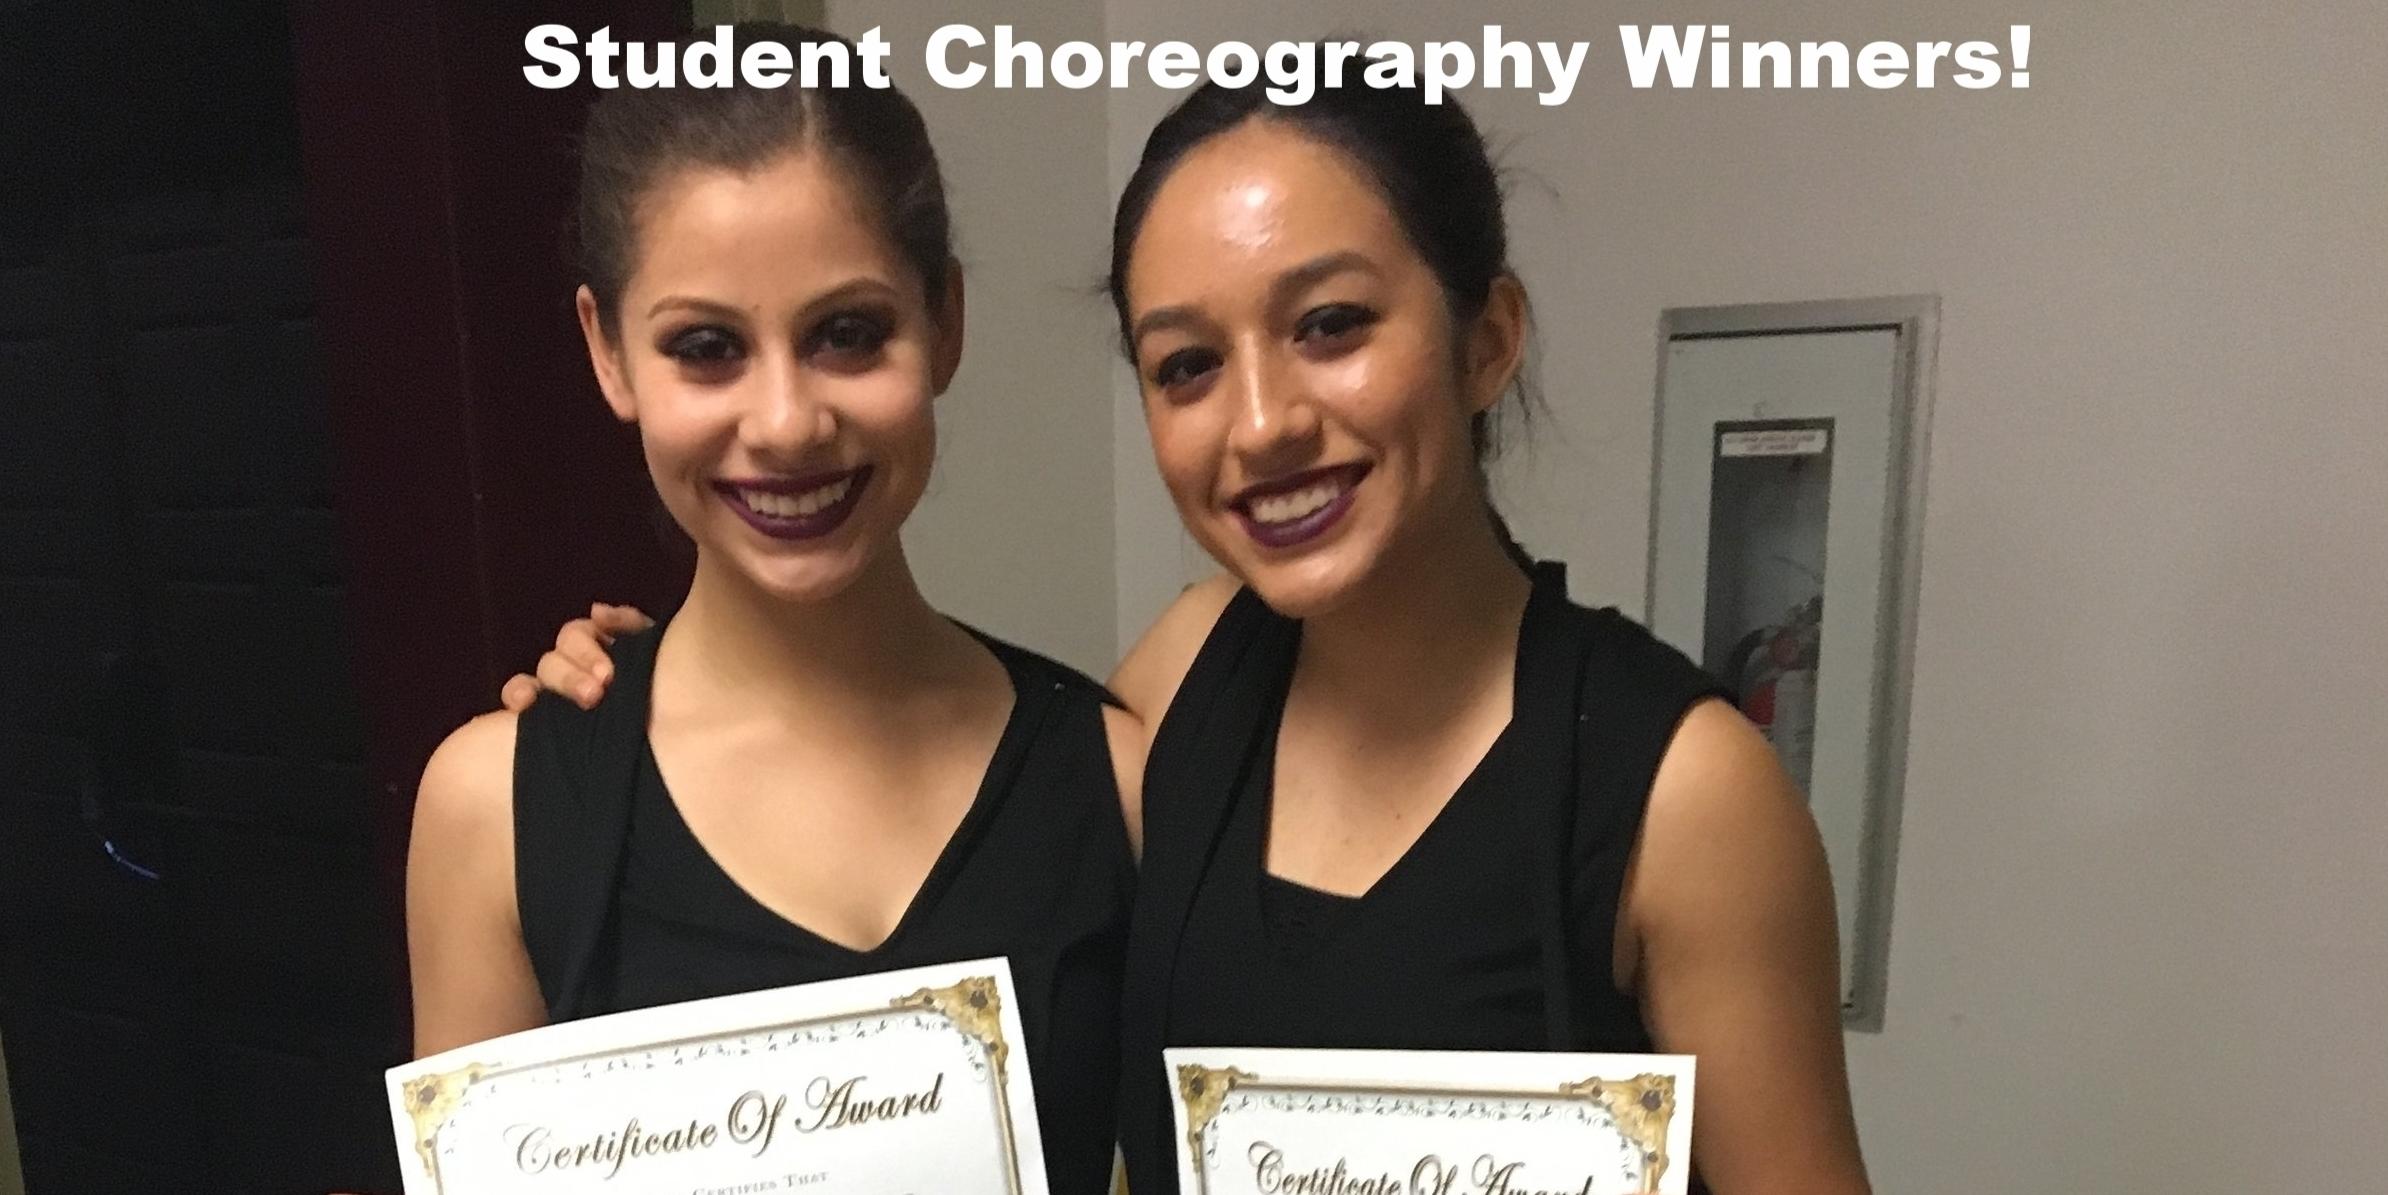 Student Choreography Award Winners.jpg